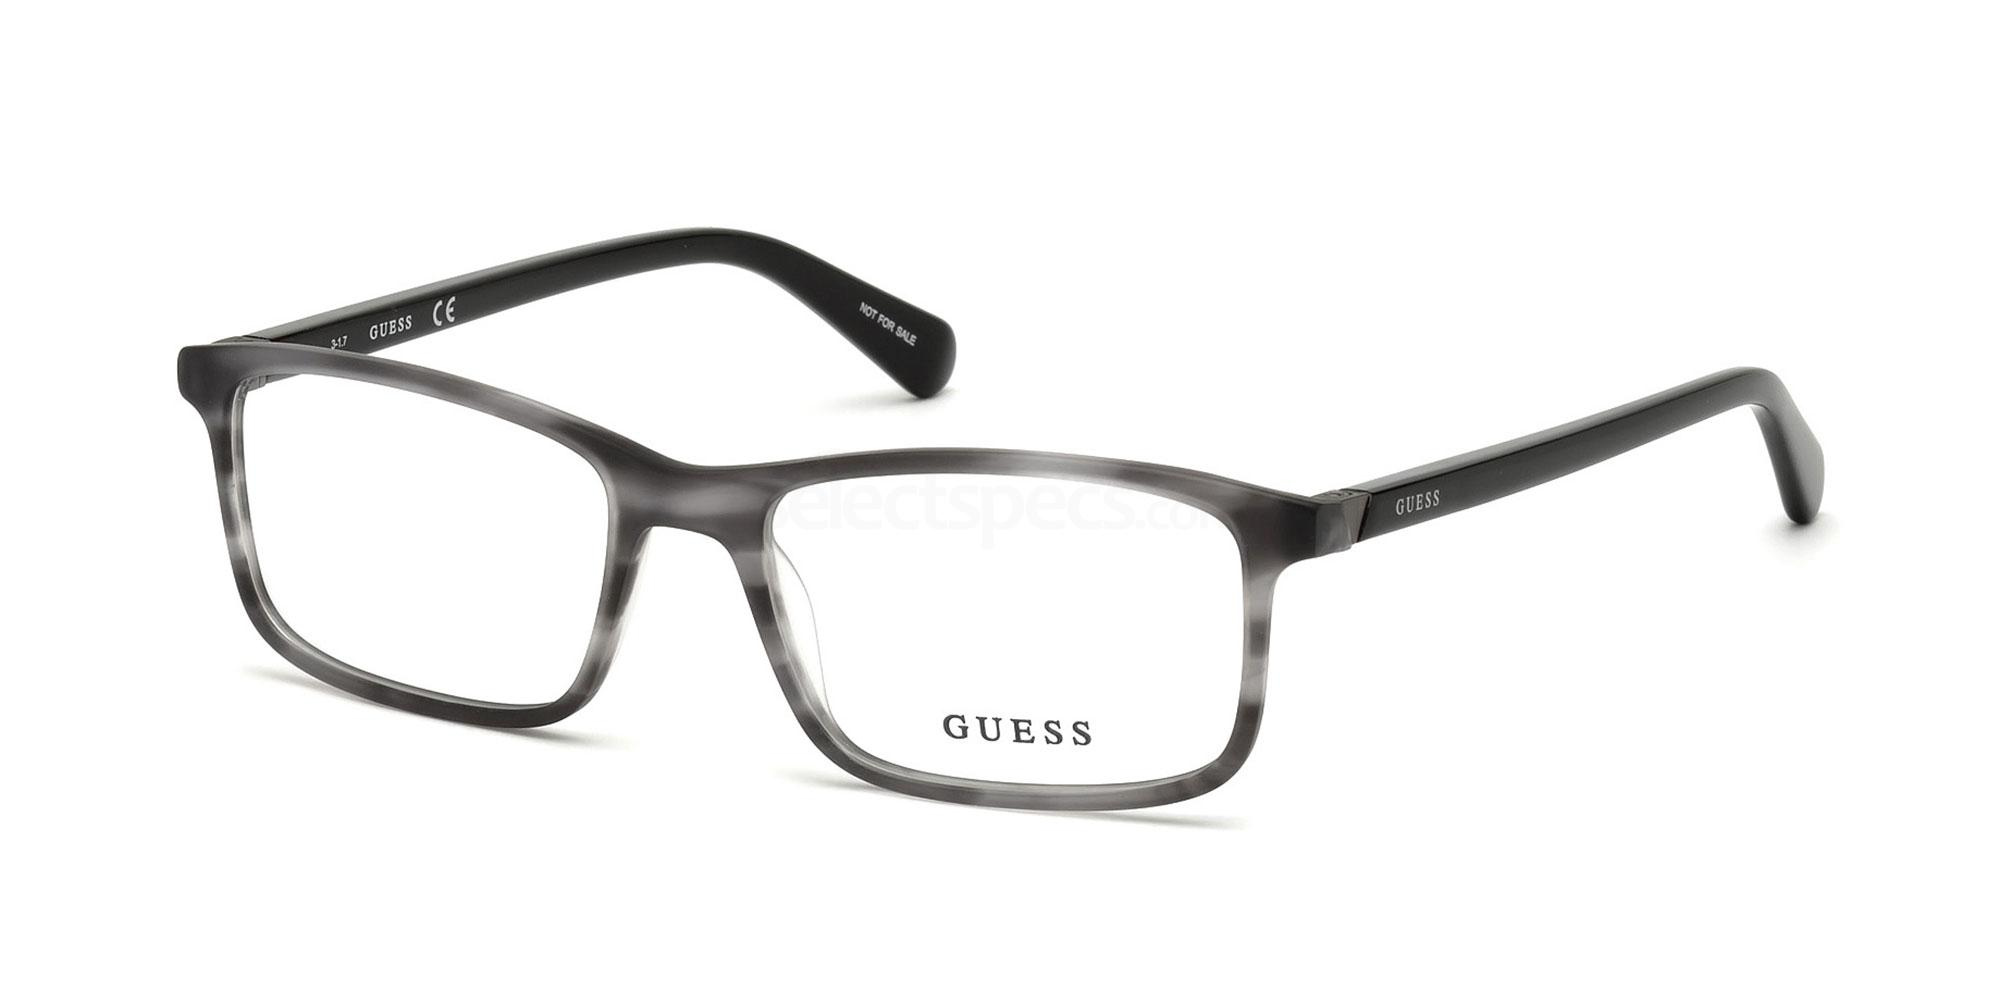 020 GU1948 Glasses, Guess